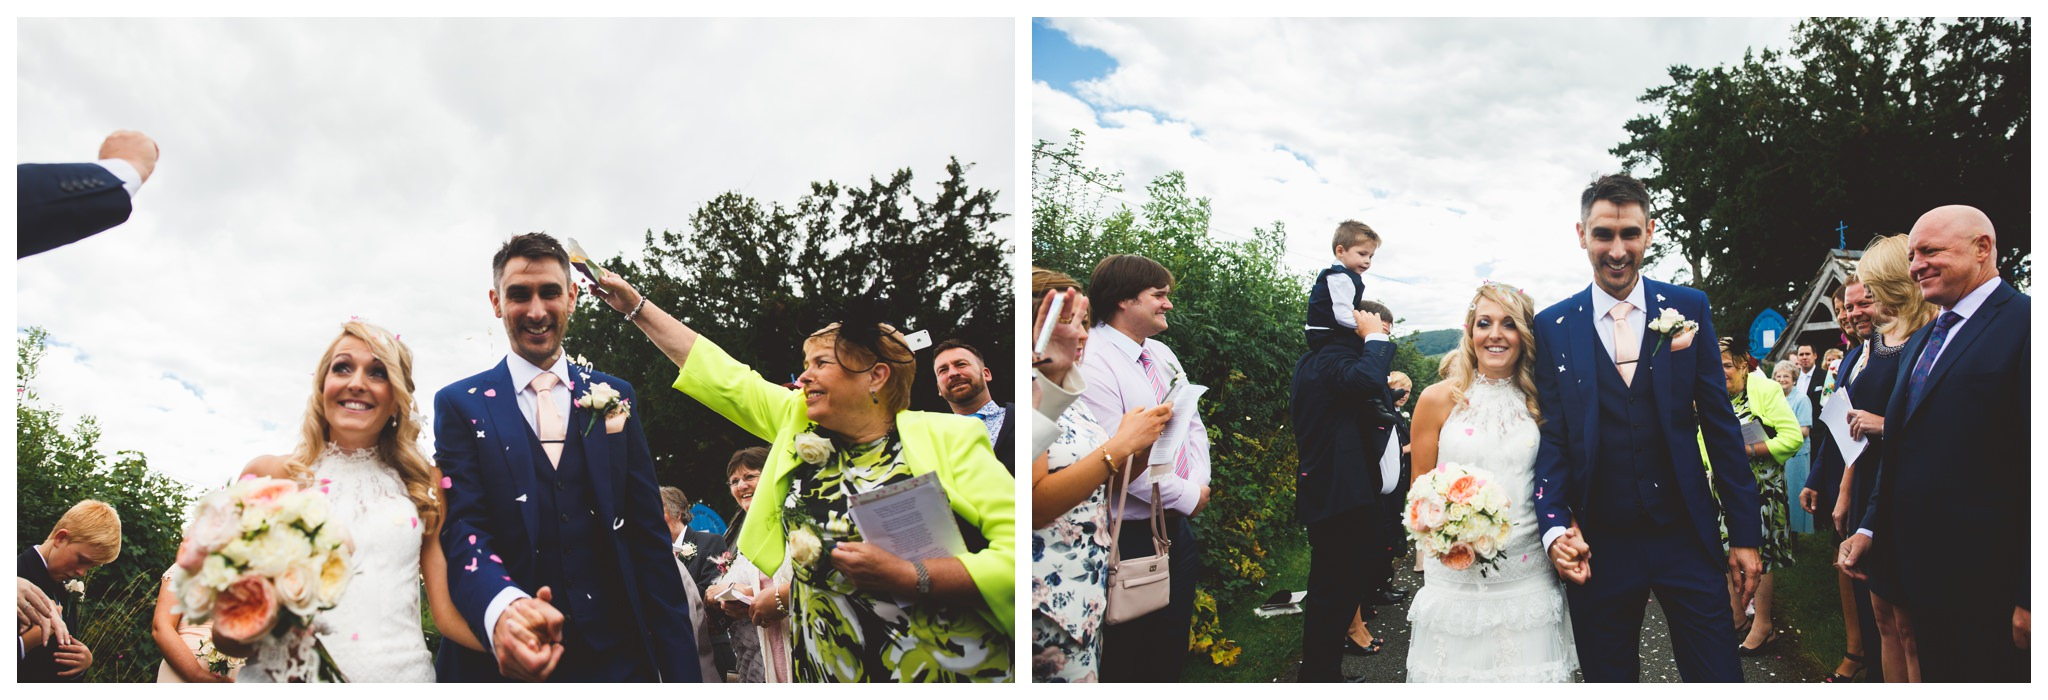 Richard Savage Photography - Wedding - Peterstone Court Brecon - 2016-05-11_0030